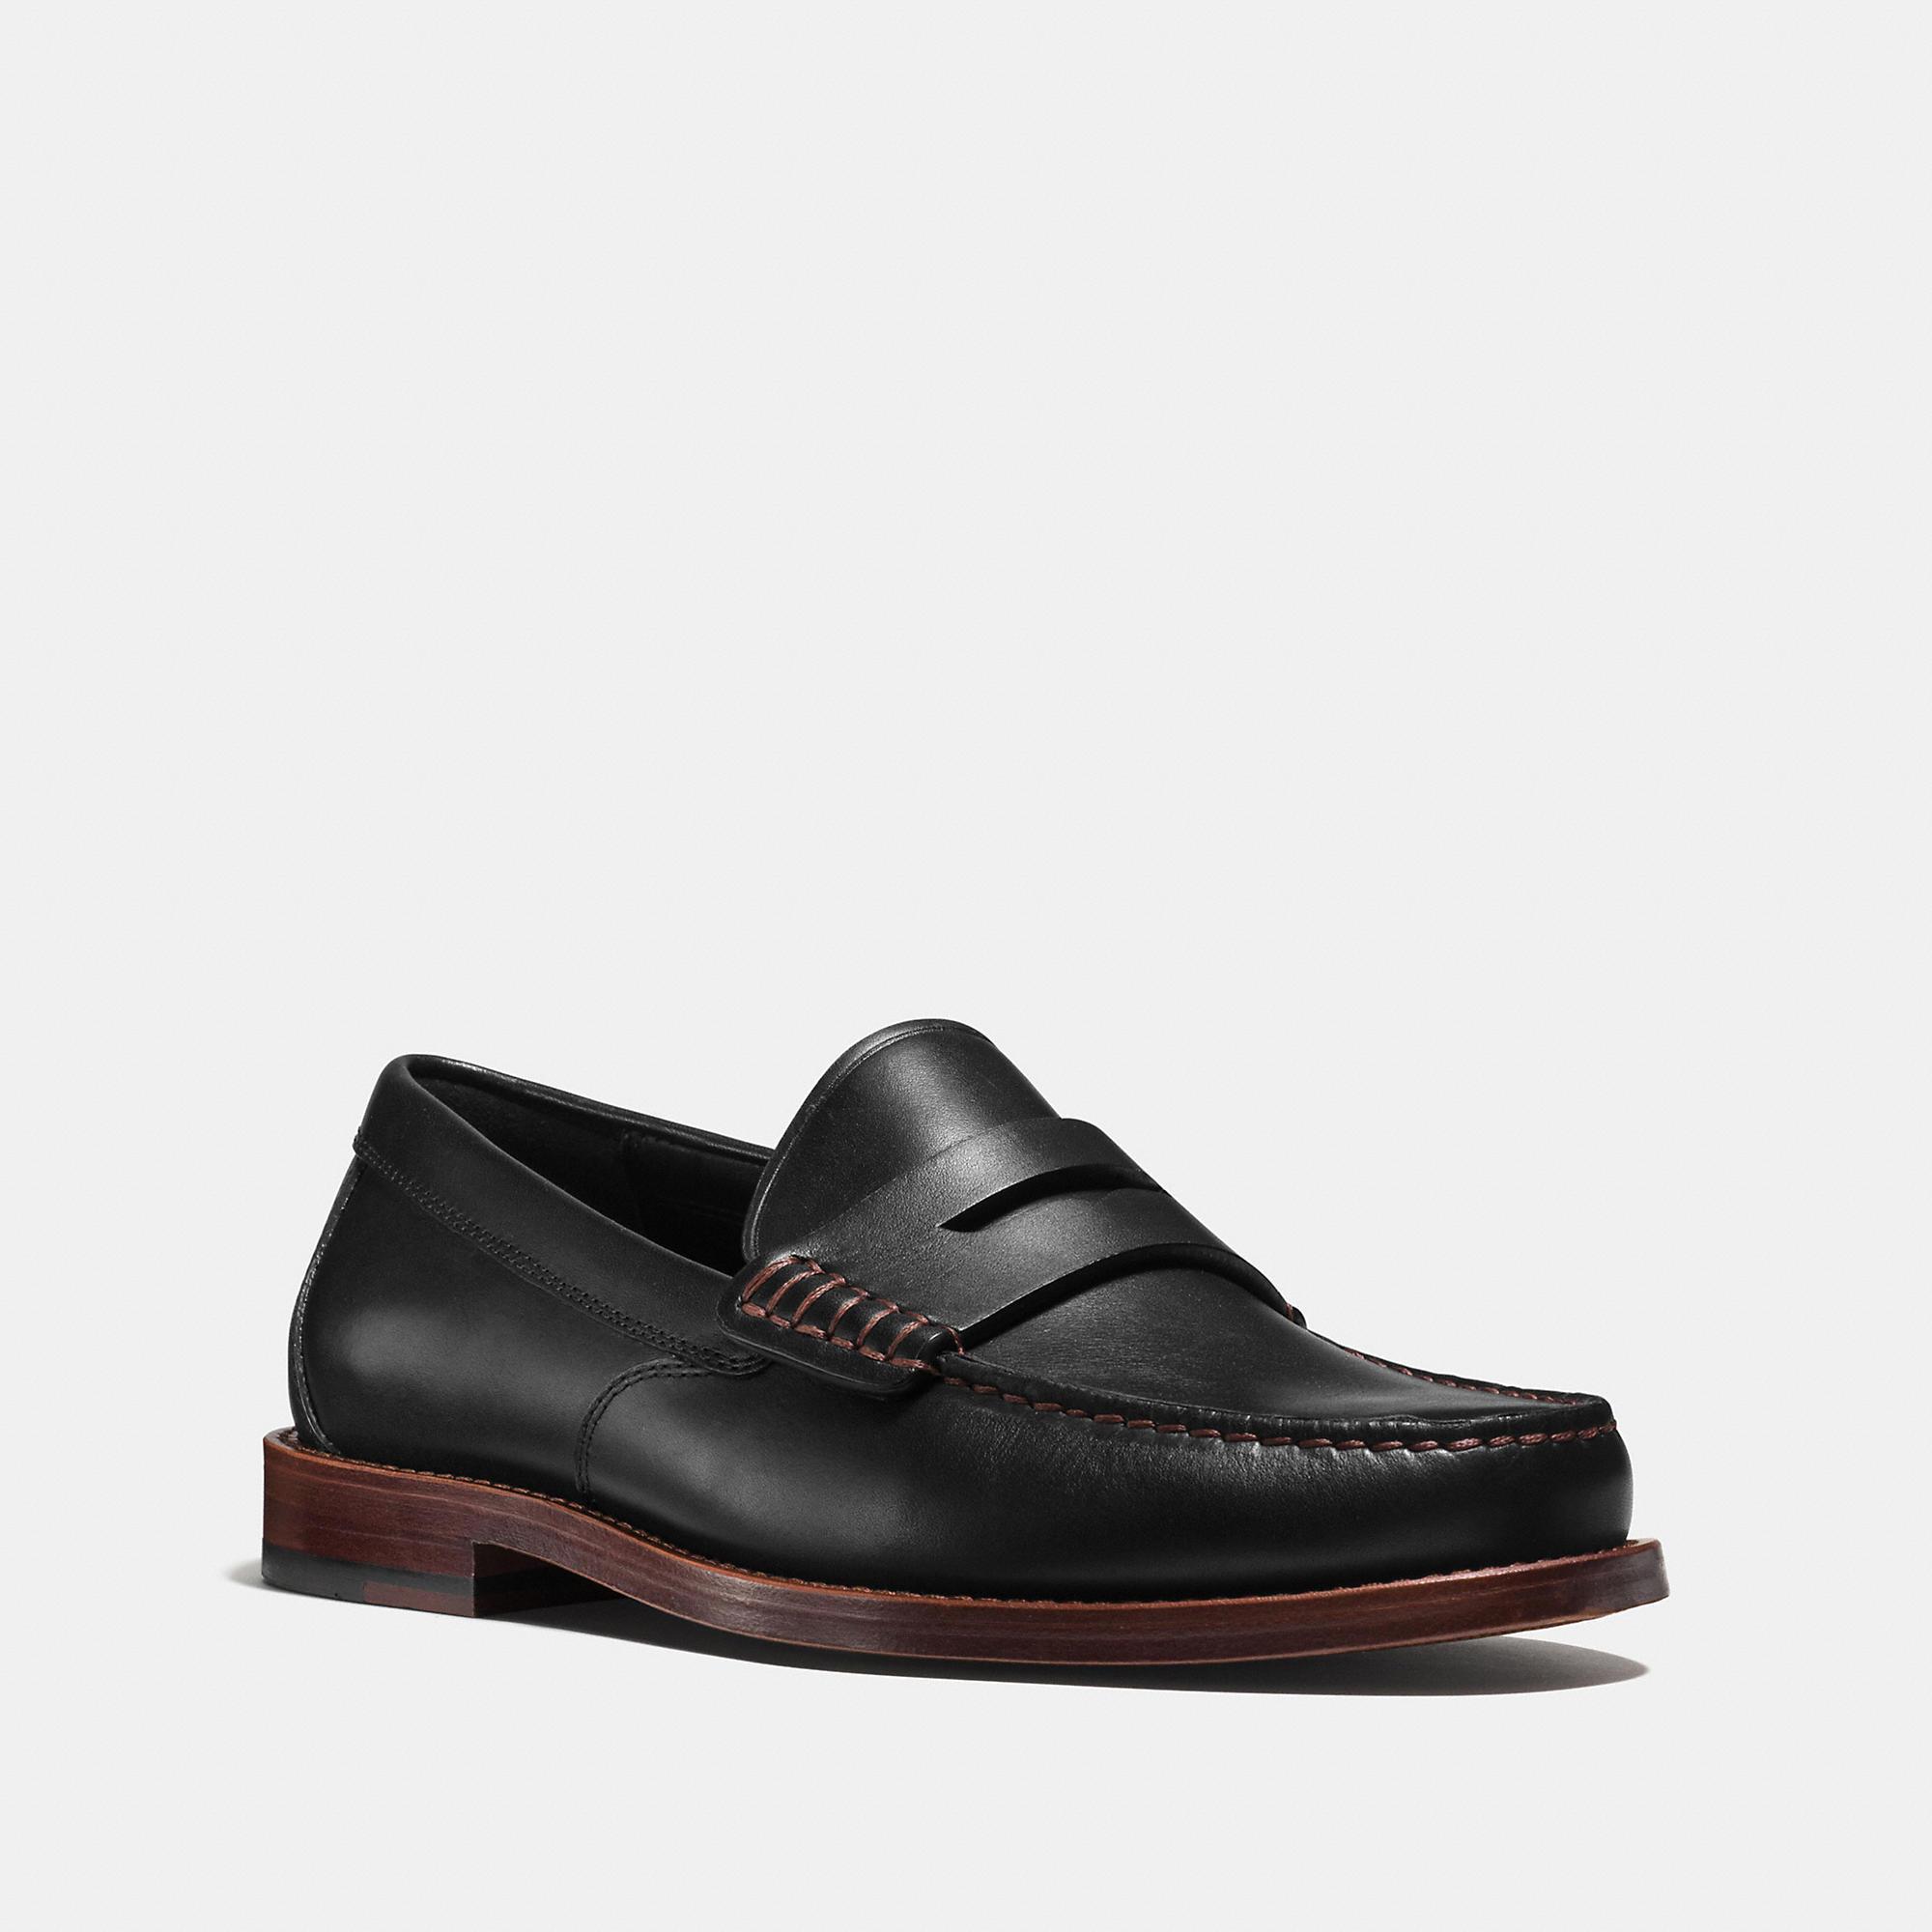 Coach Manhattan Leather Loafer